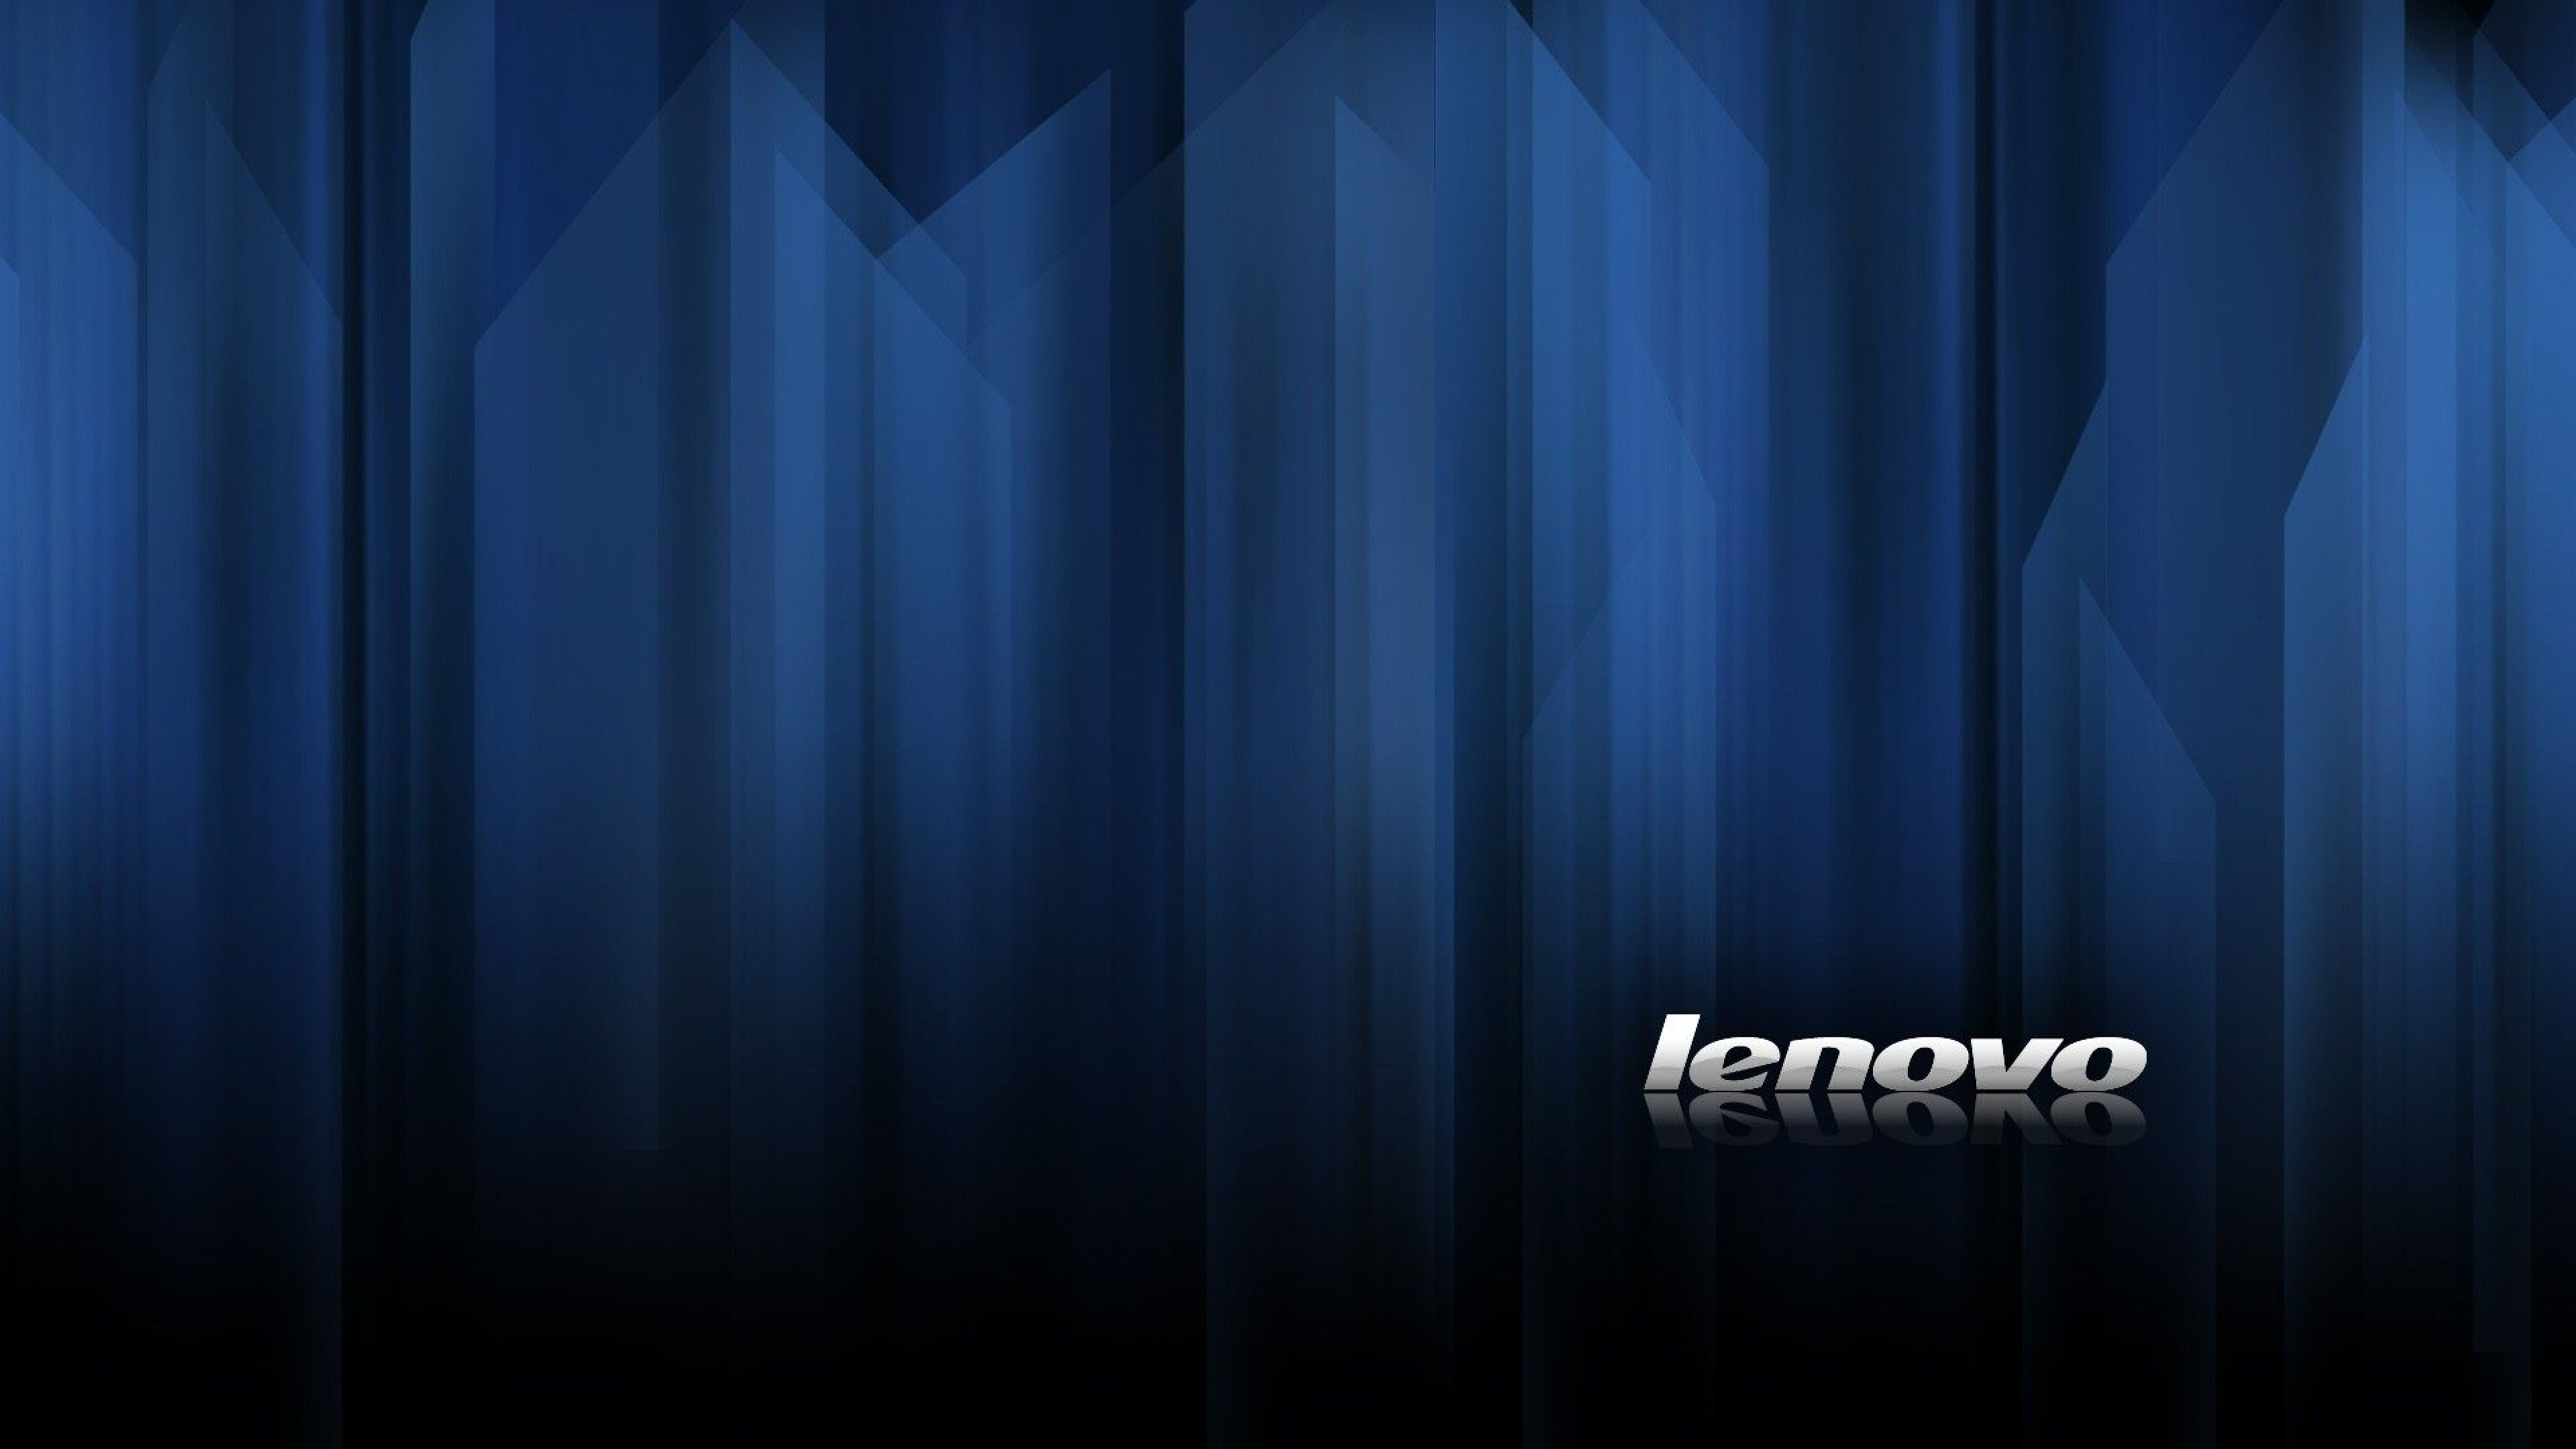 50] Ultra 4K HD Lenovo Wallpaper on WallpaperSafari 3840x2160